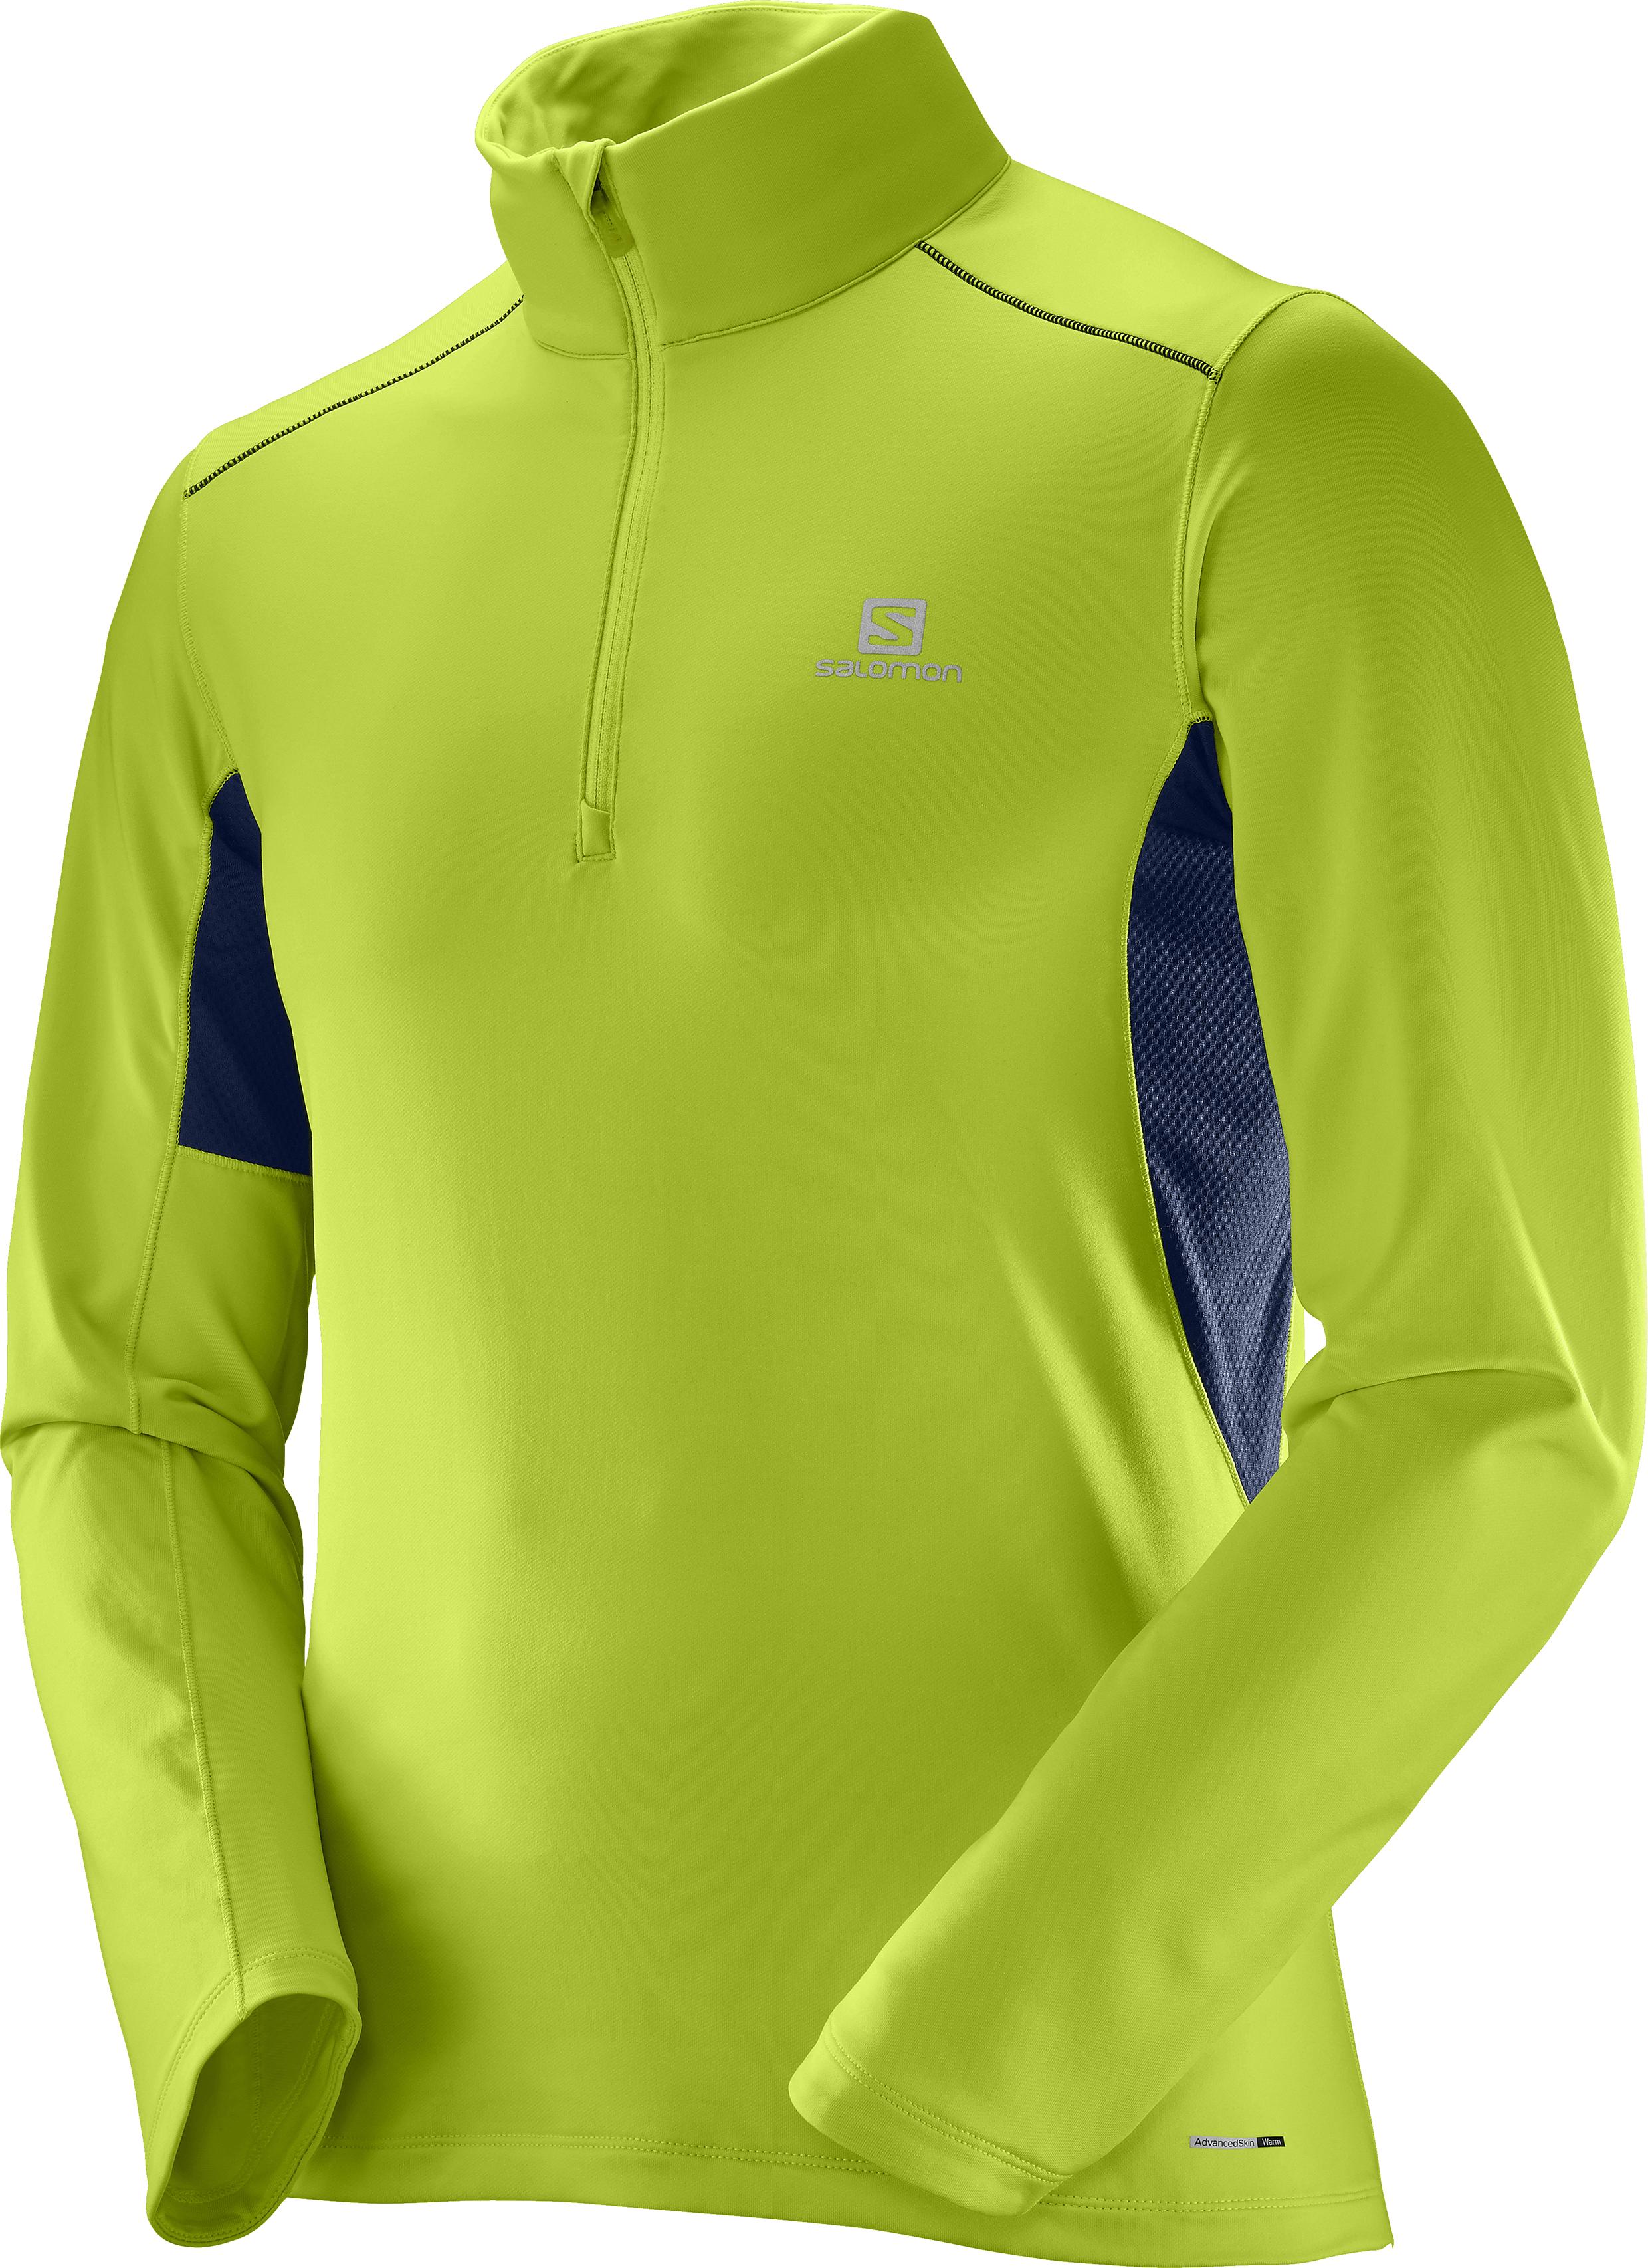 Salomon Agile Warm HZ Mid Acid Lime/Dress Blue 397139 žlutá L